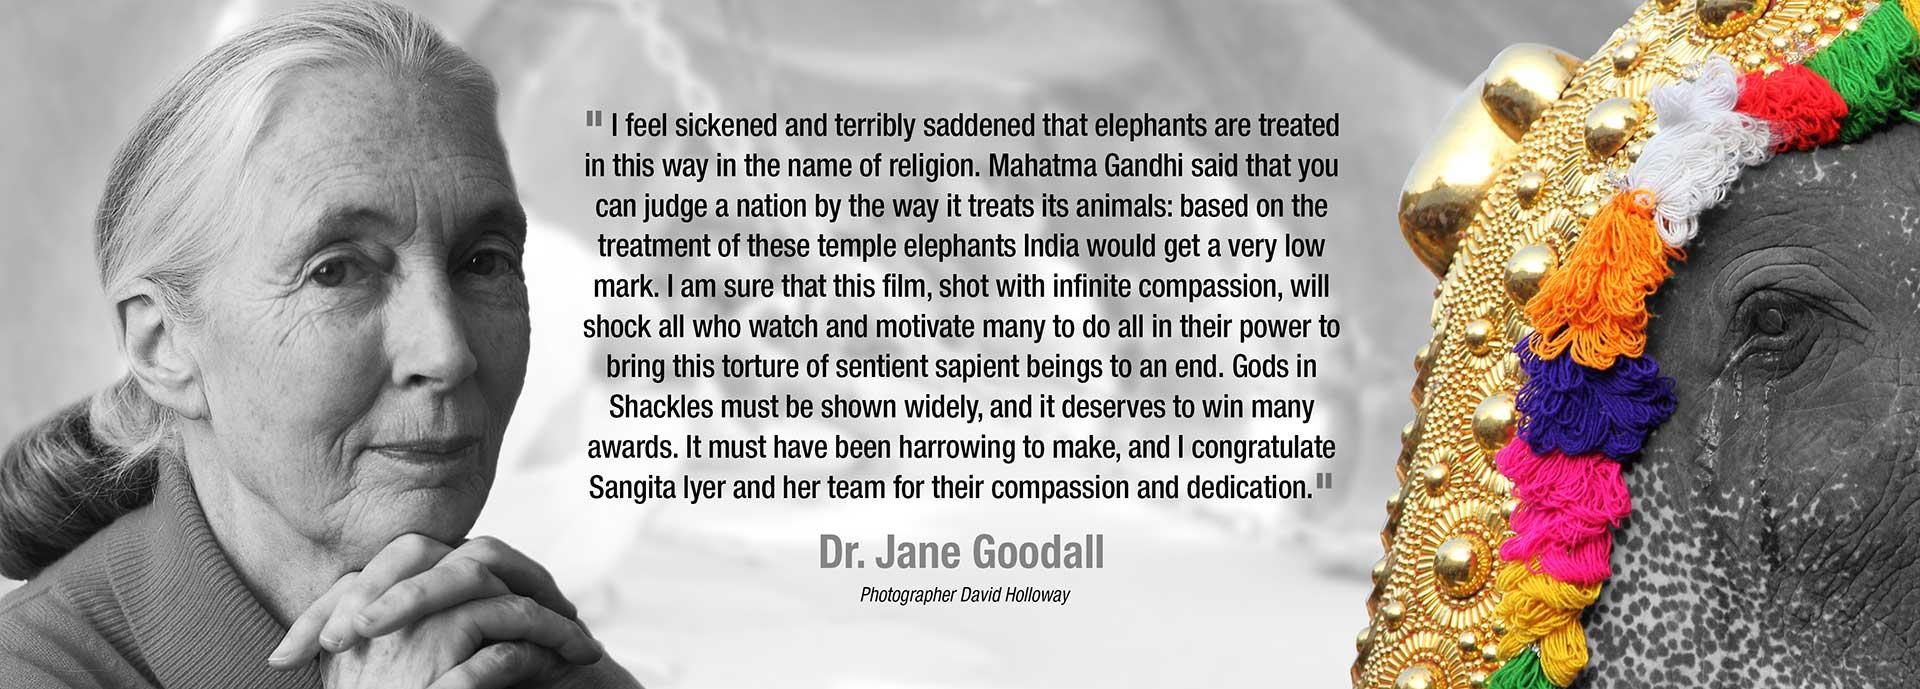 godsinshackles-janegoodall-endorsement